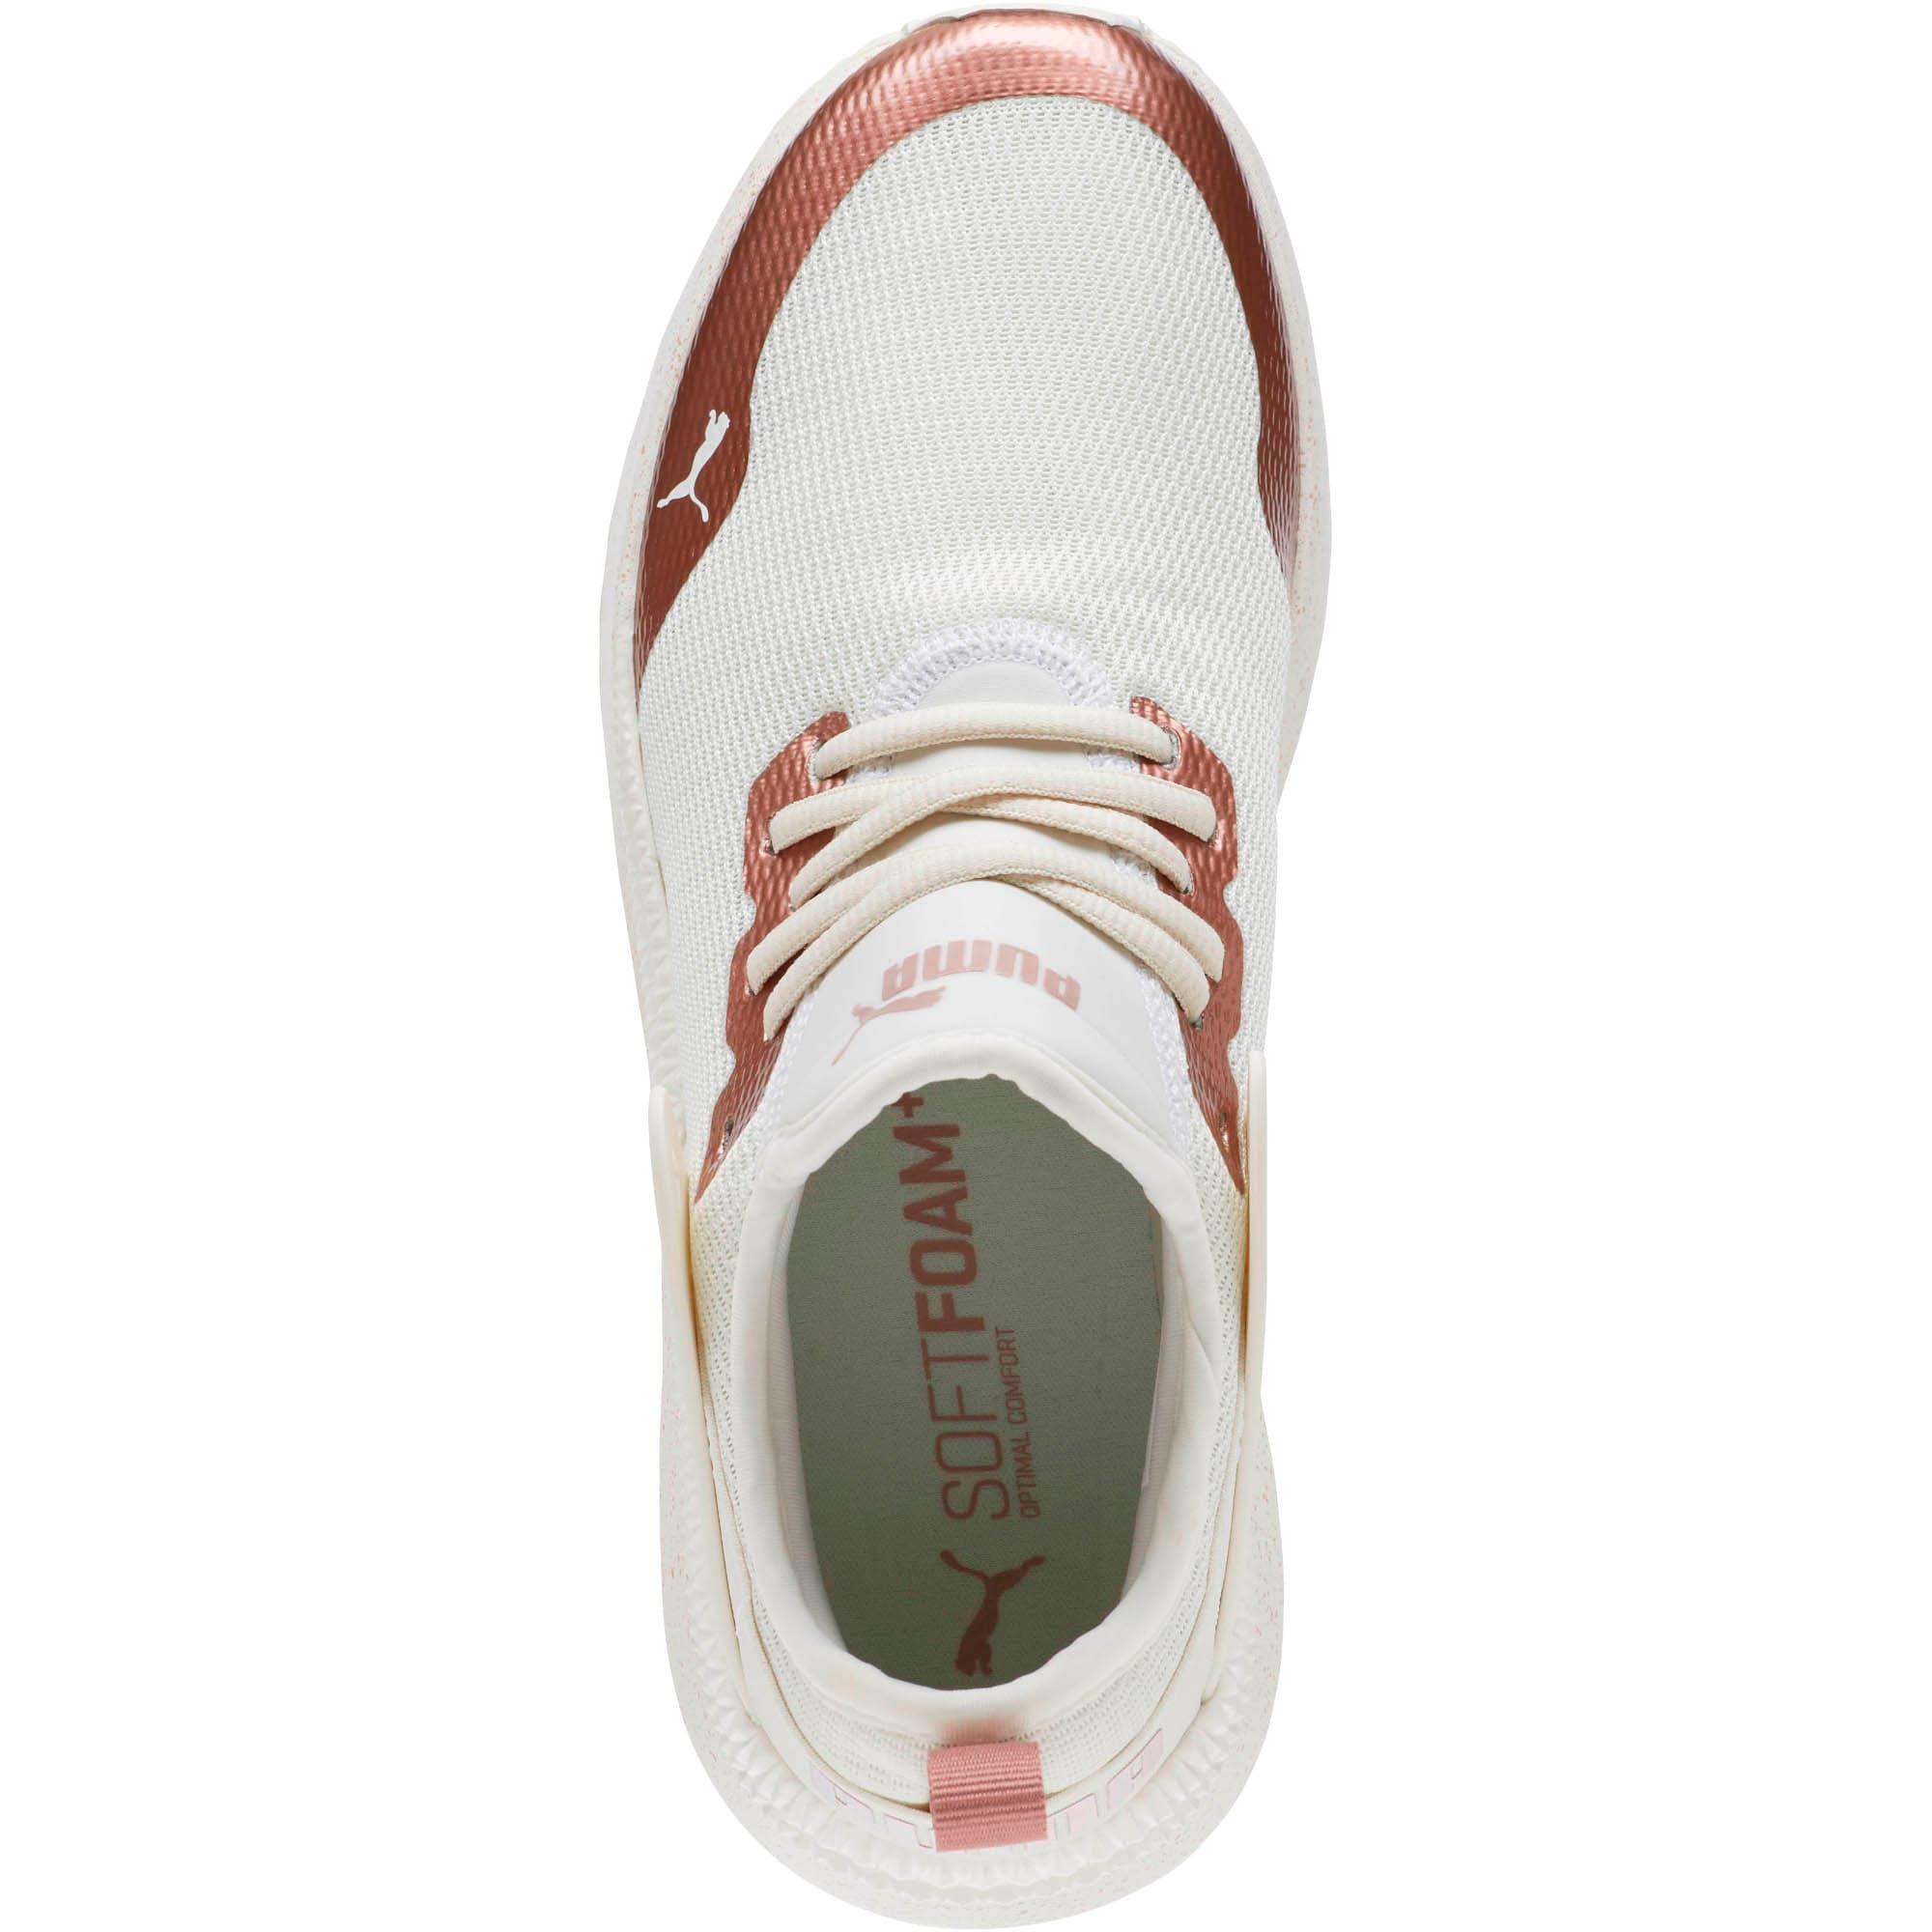 Thumbnail 5 of Pacer Nex tCage Metallic Speckle Women's Sneakers, Whisper White-Rose Gold, medium